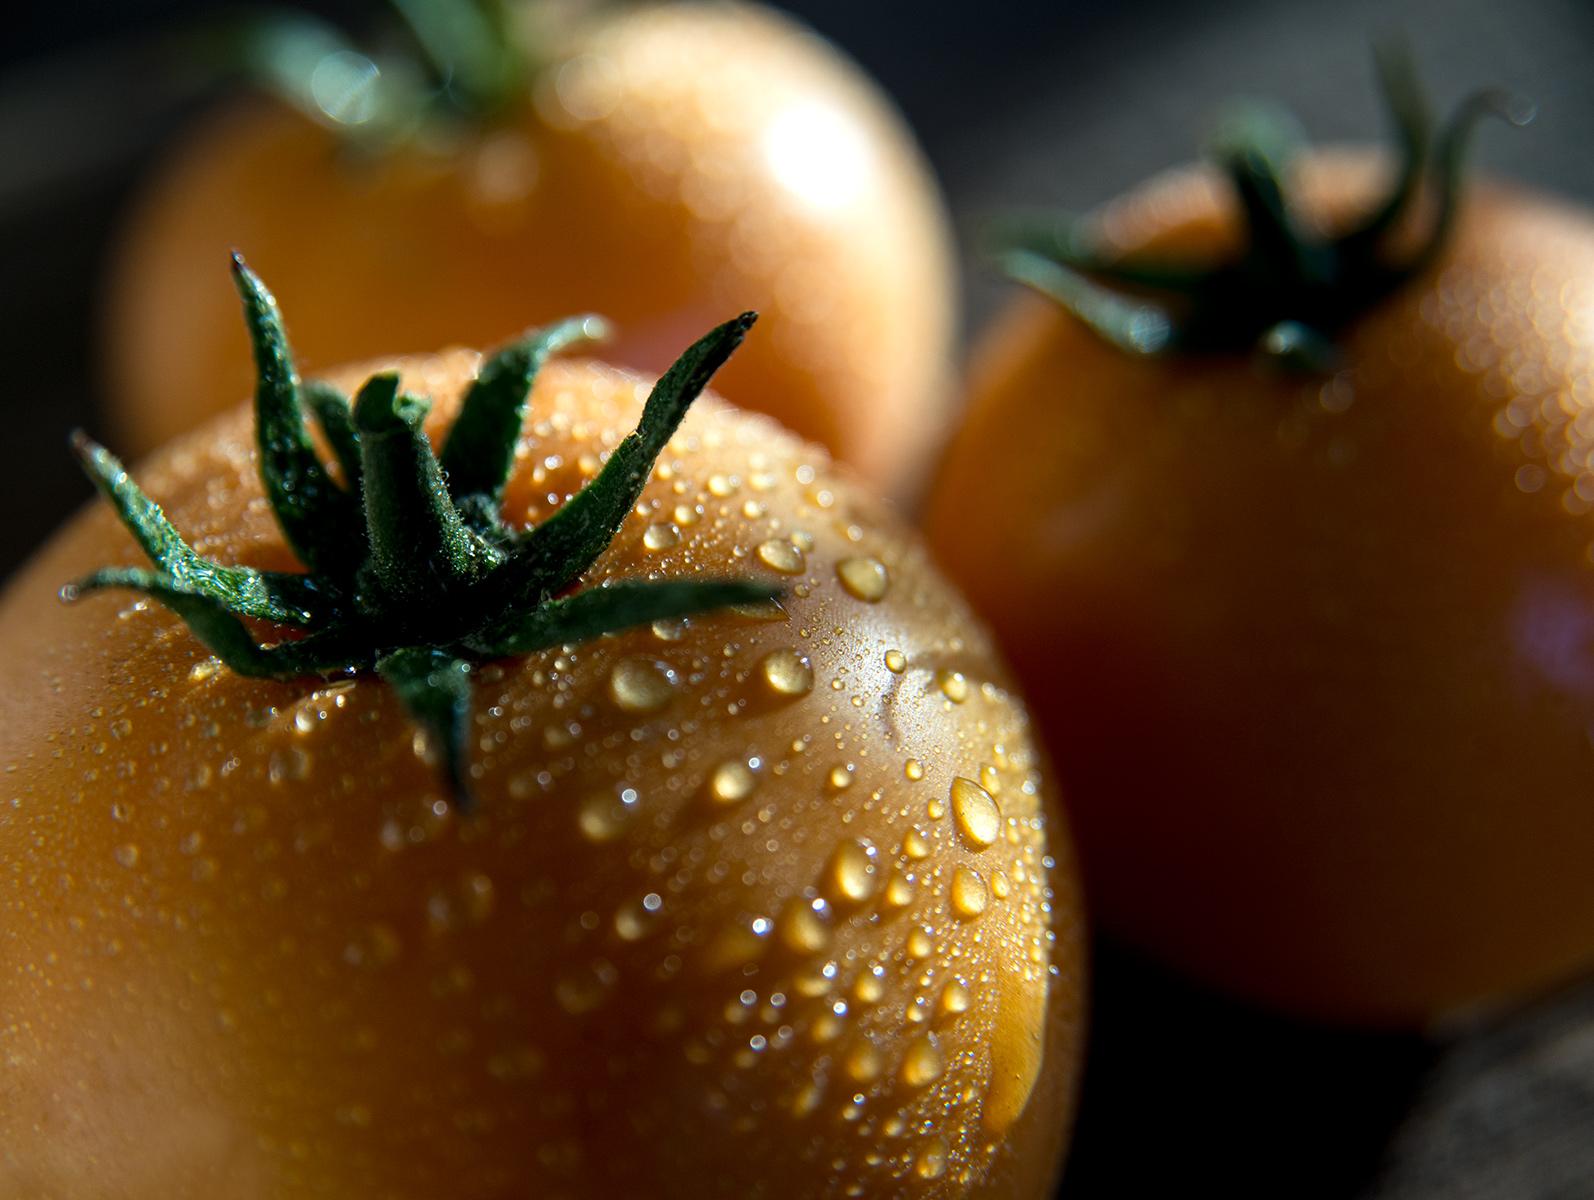 Yellow Tomato-Carl Kravats Food Photography